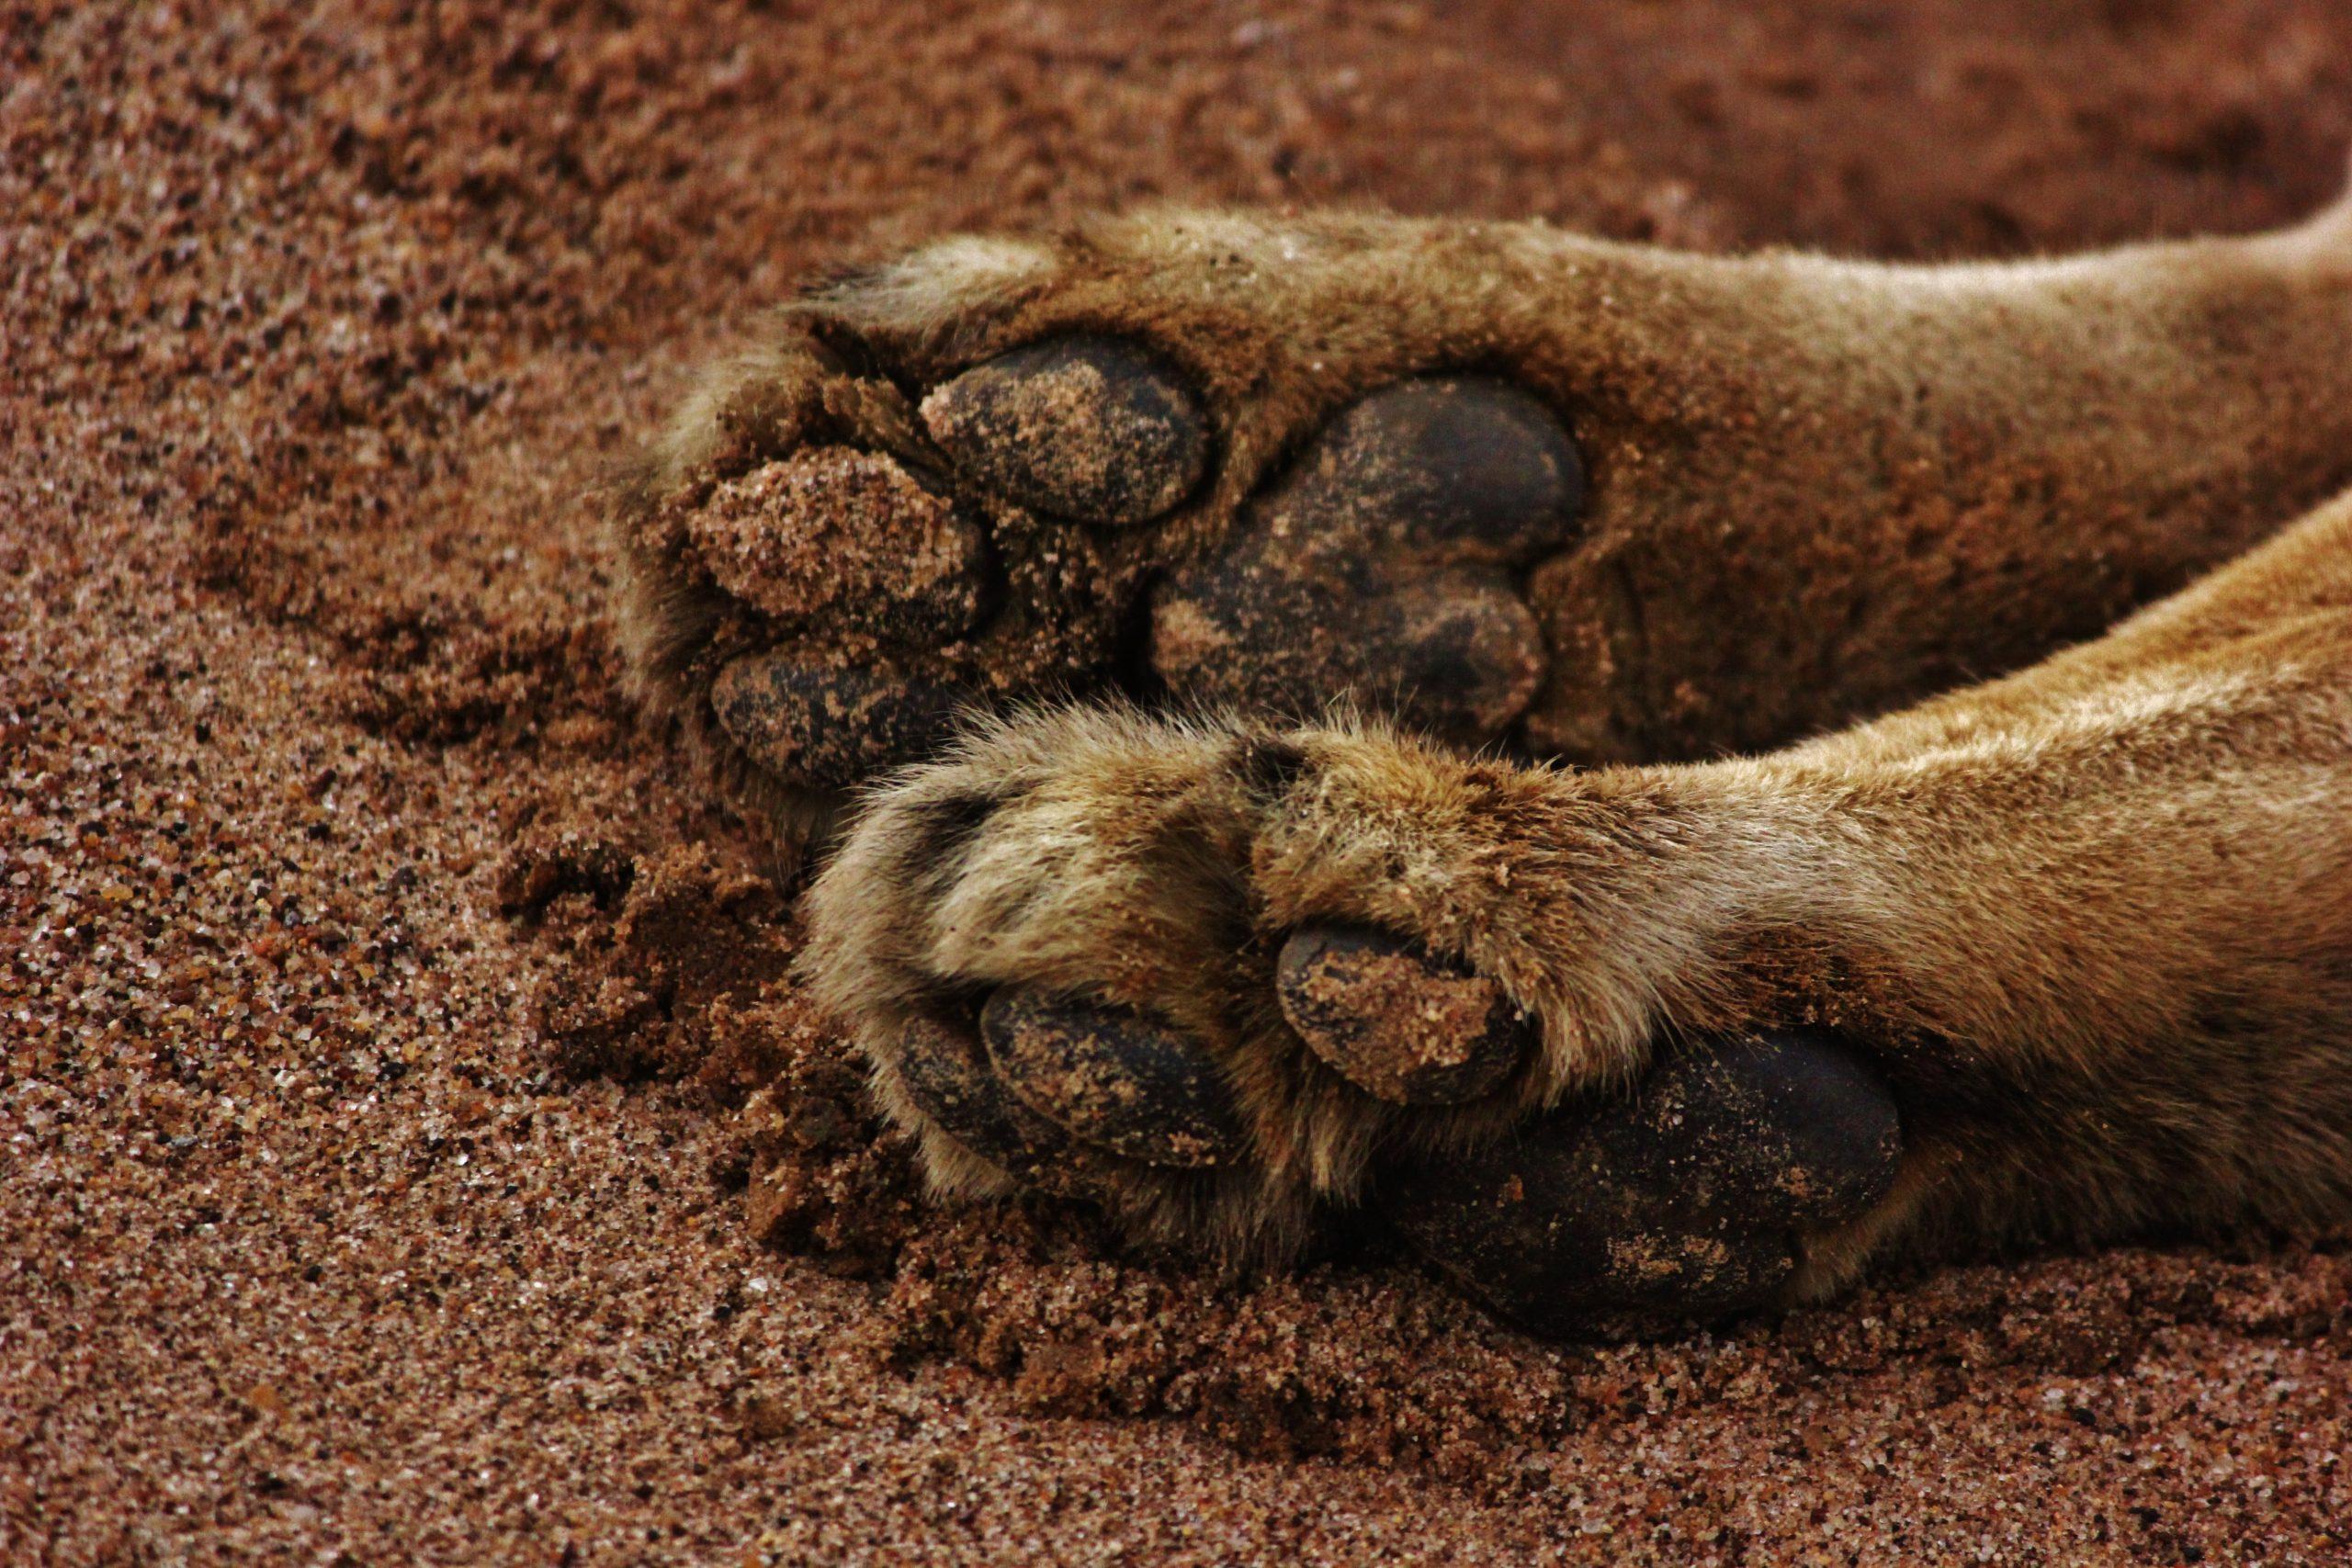 Paws of an animal